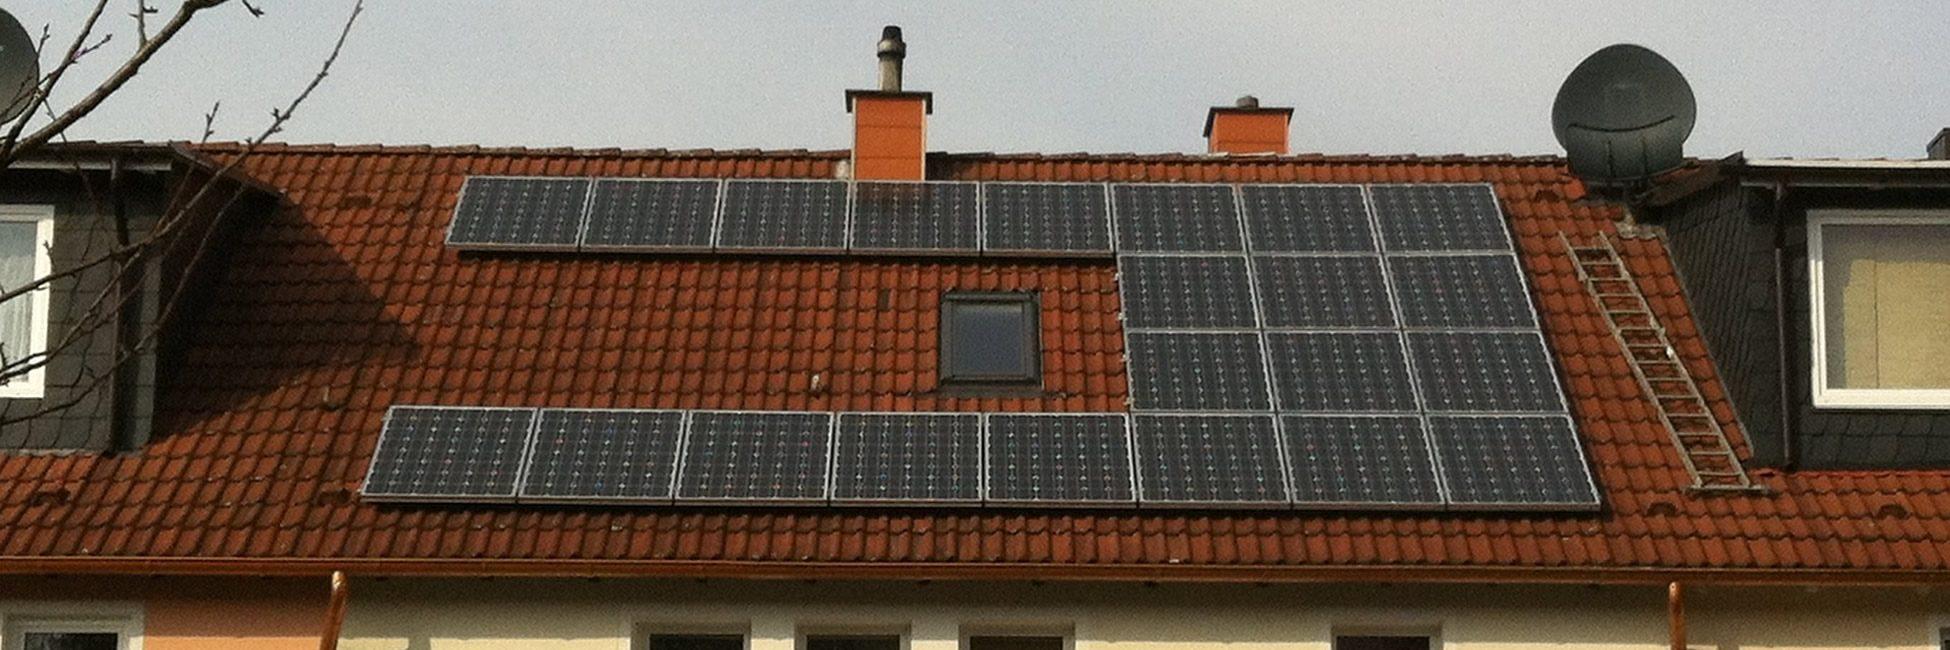 solar-modules-1634596_1920-1.jpg